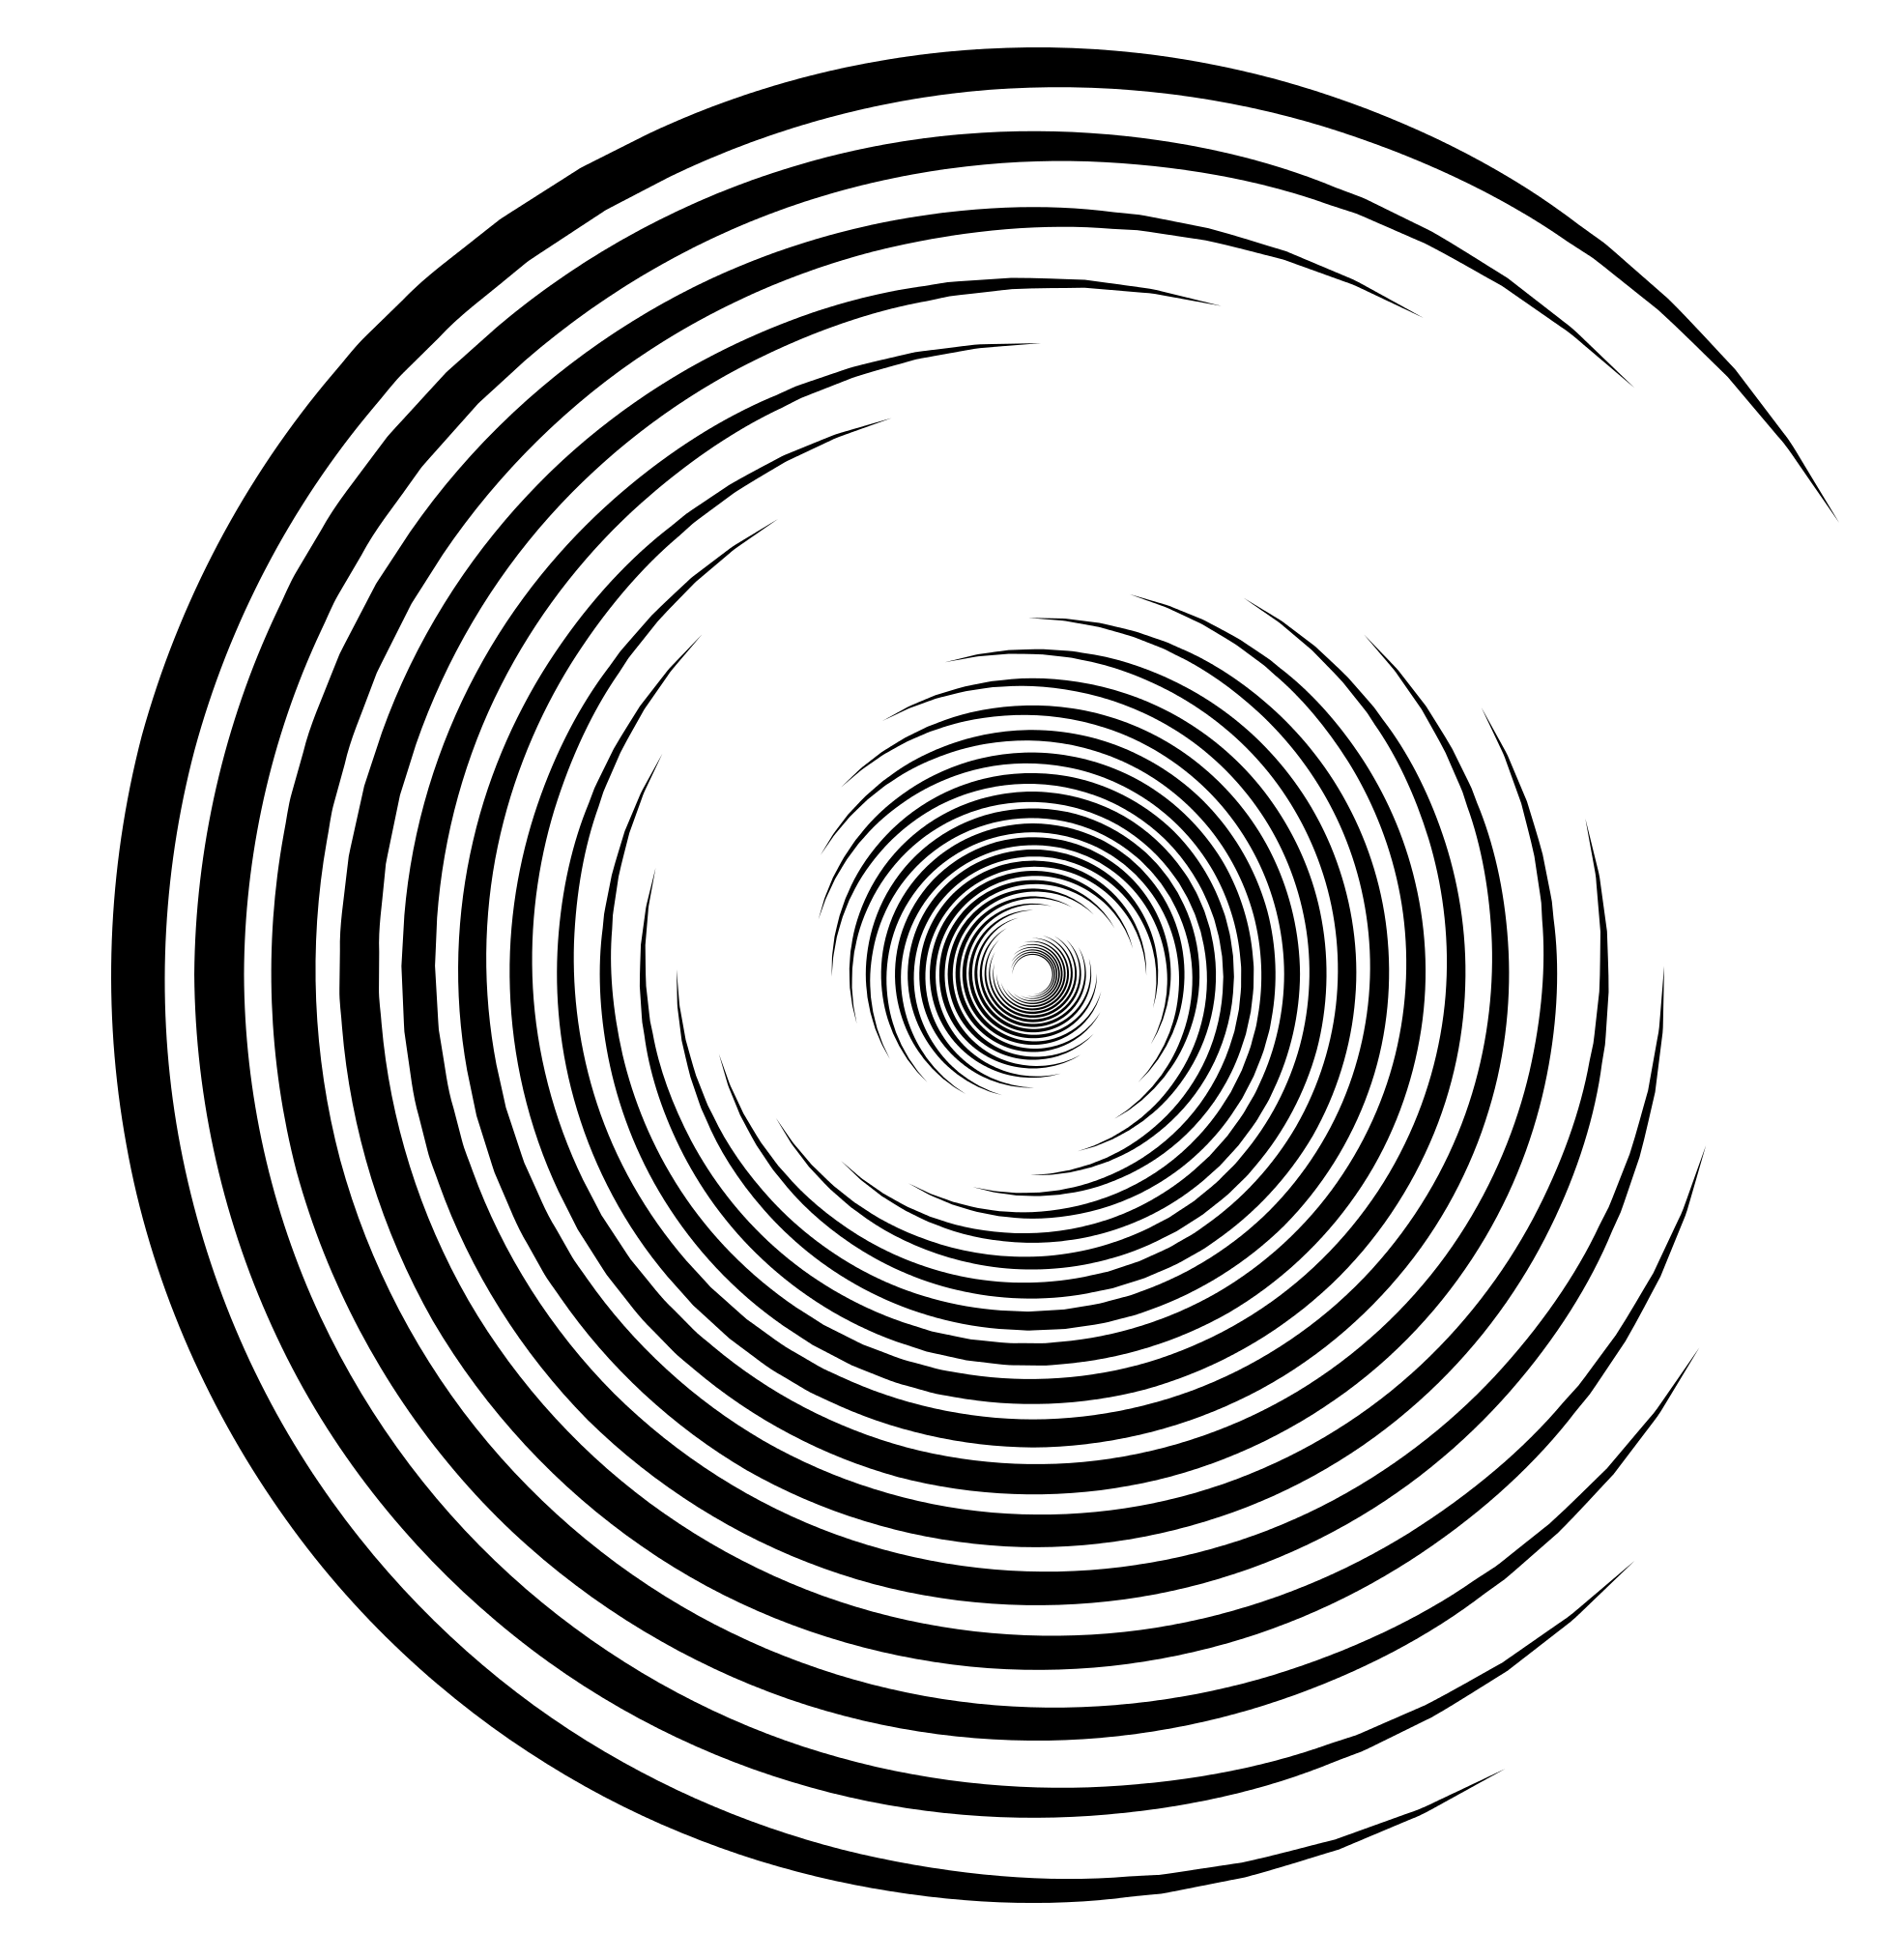 1968x2028 Circle Swirl Png Transparent Image